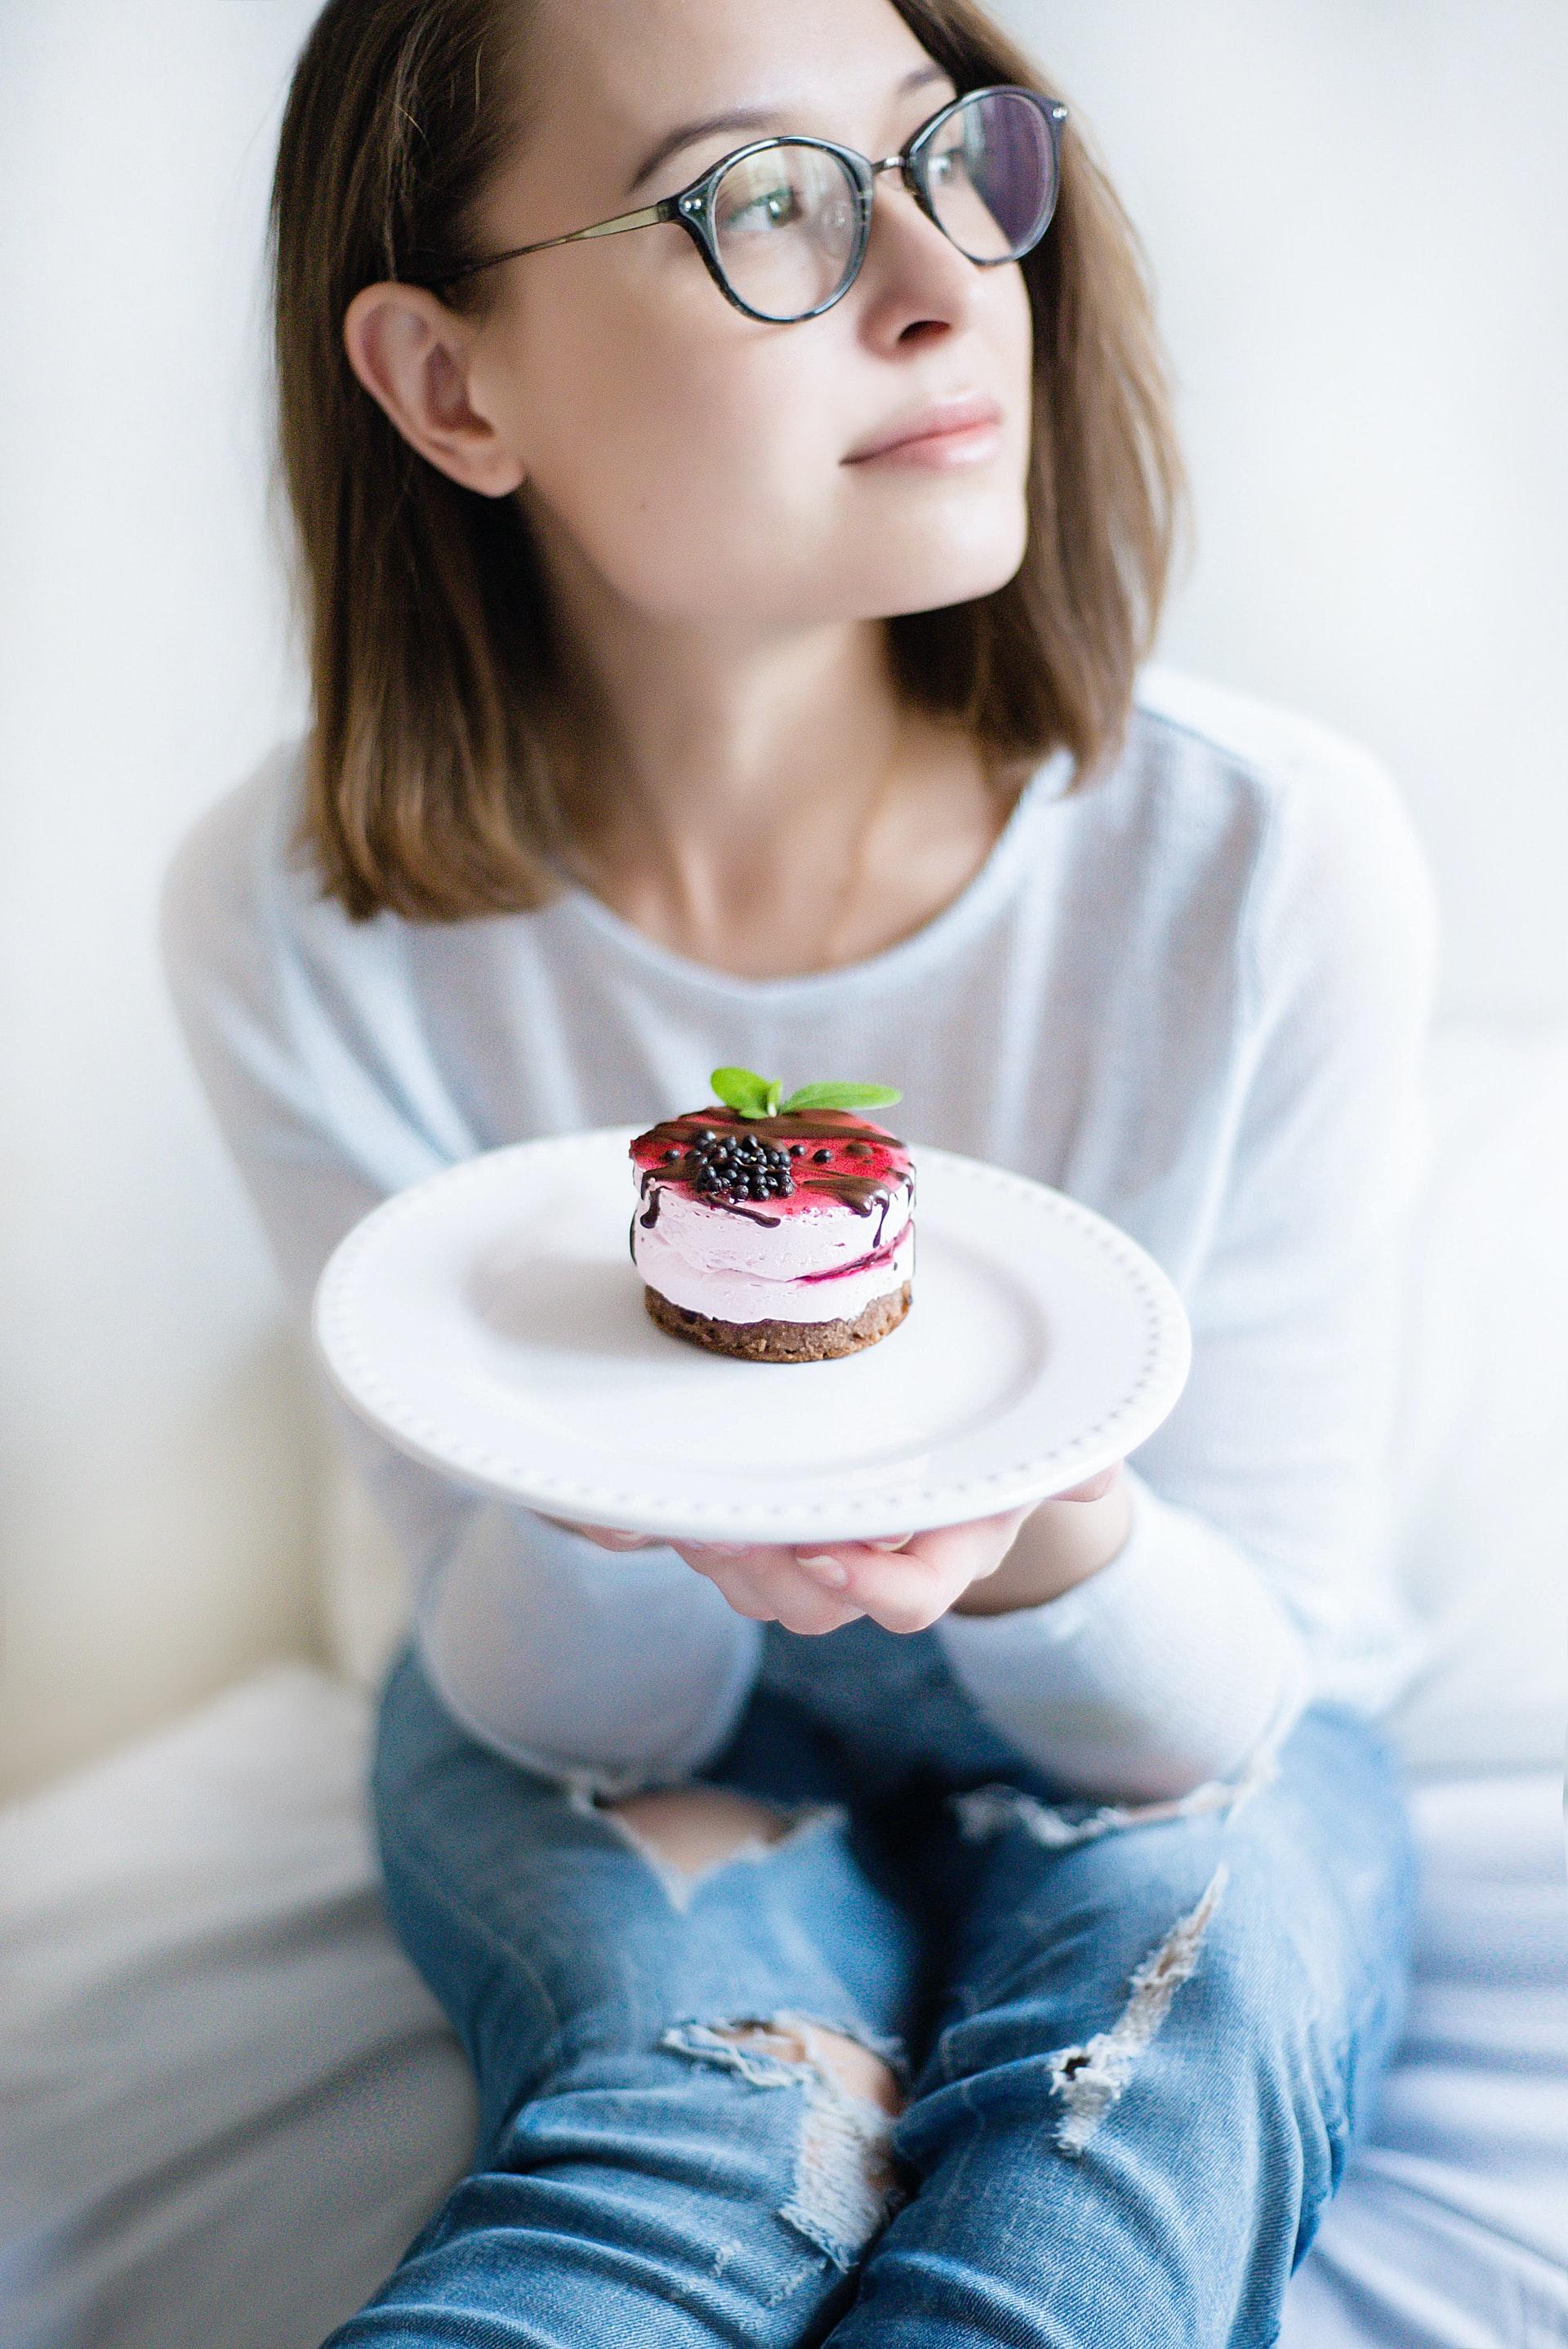 Raslojavanje zdrave ili pravilne ishrane